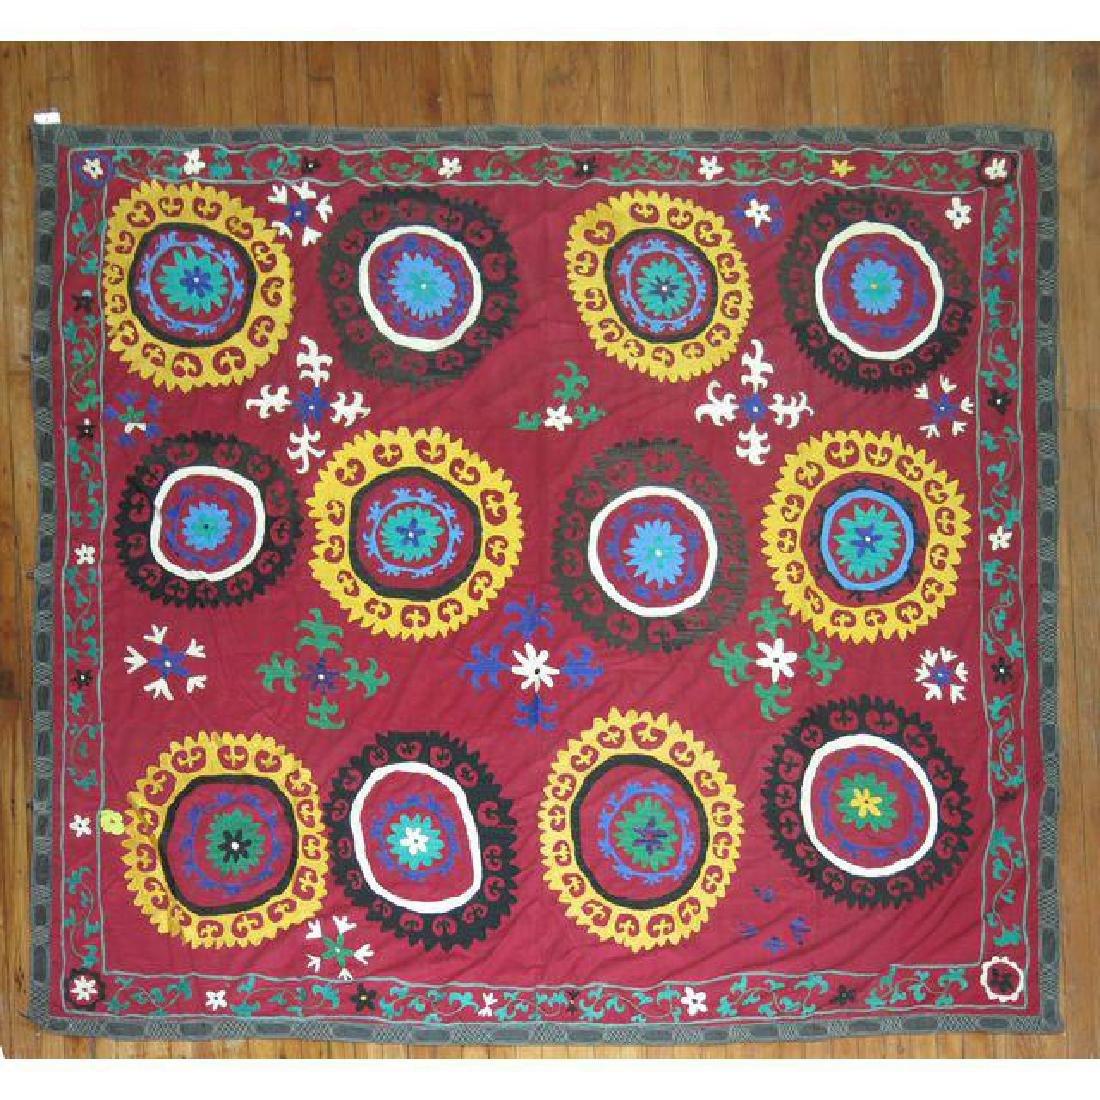 Vintage Suzanni Embroidery Throw 6.10x7.5 - 2